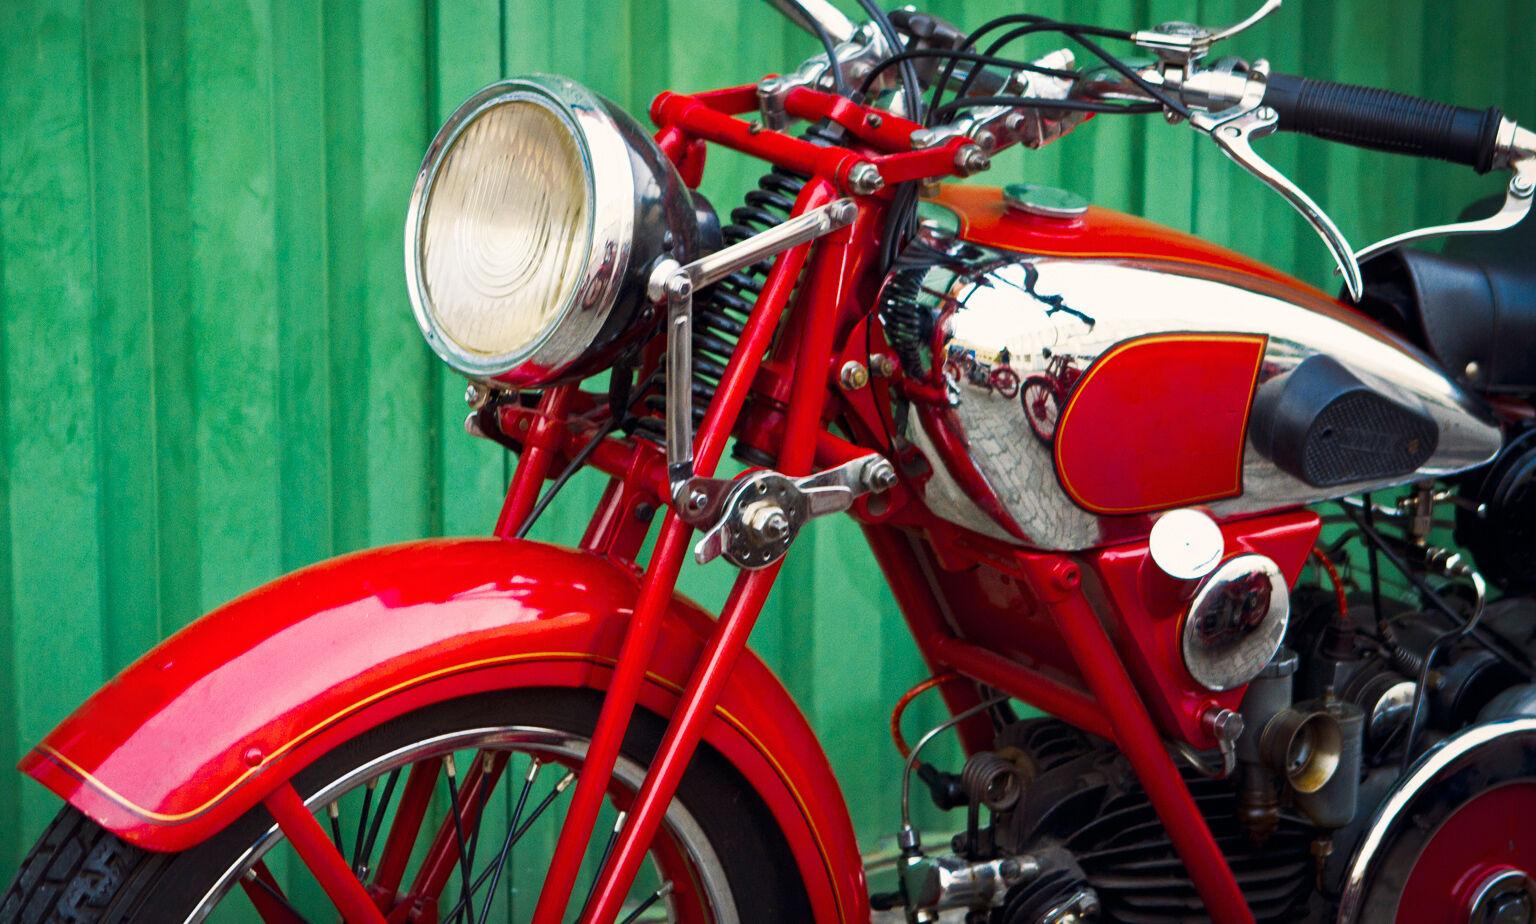 Shop No Reserve Price Motorcycles